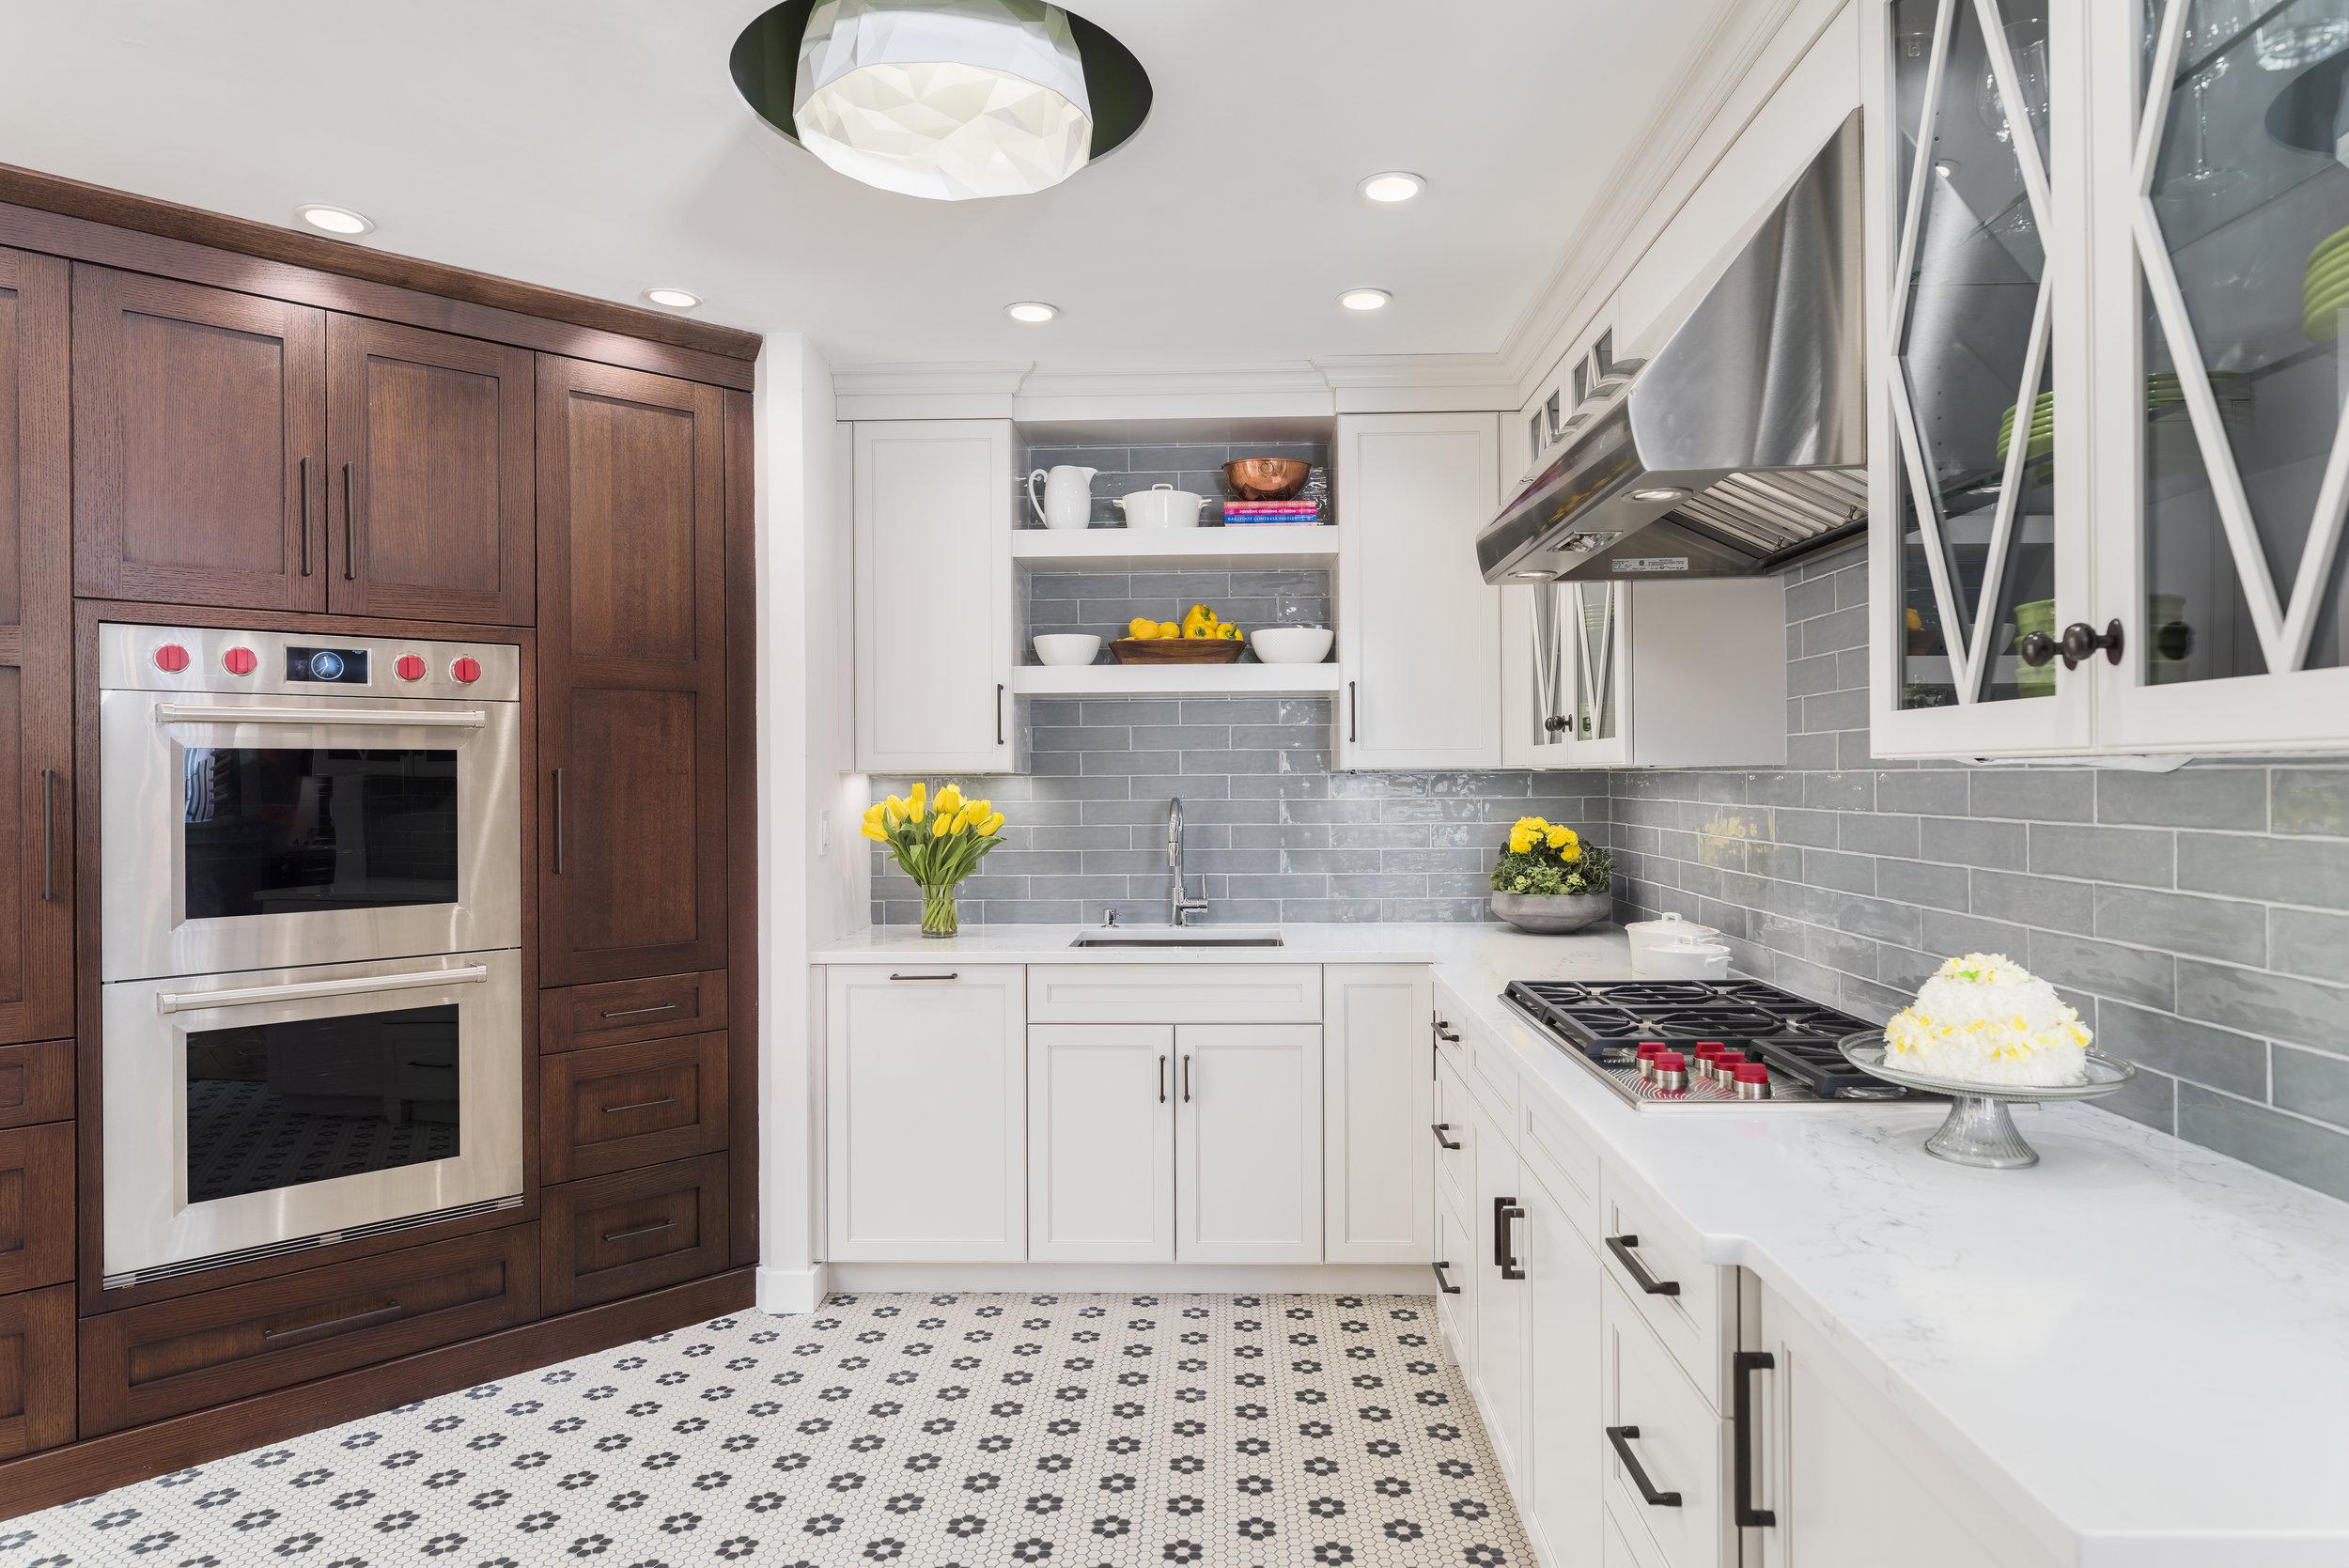 Brooklyn Brownstone-Inspired Kitchen